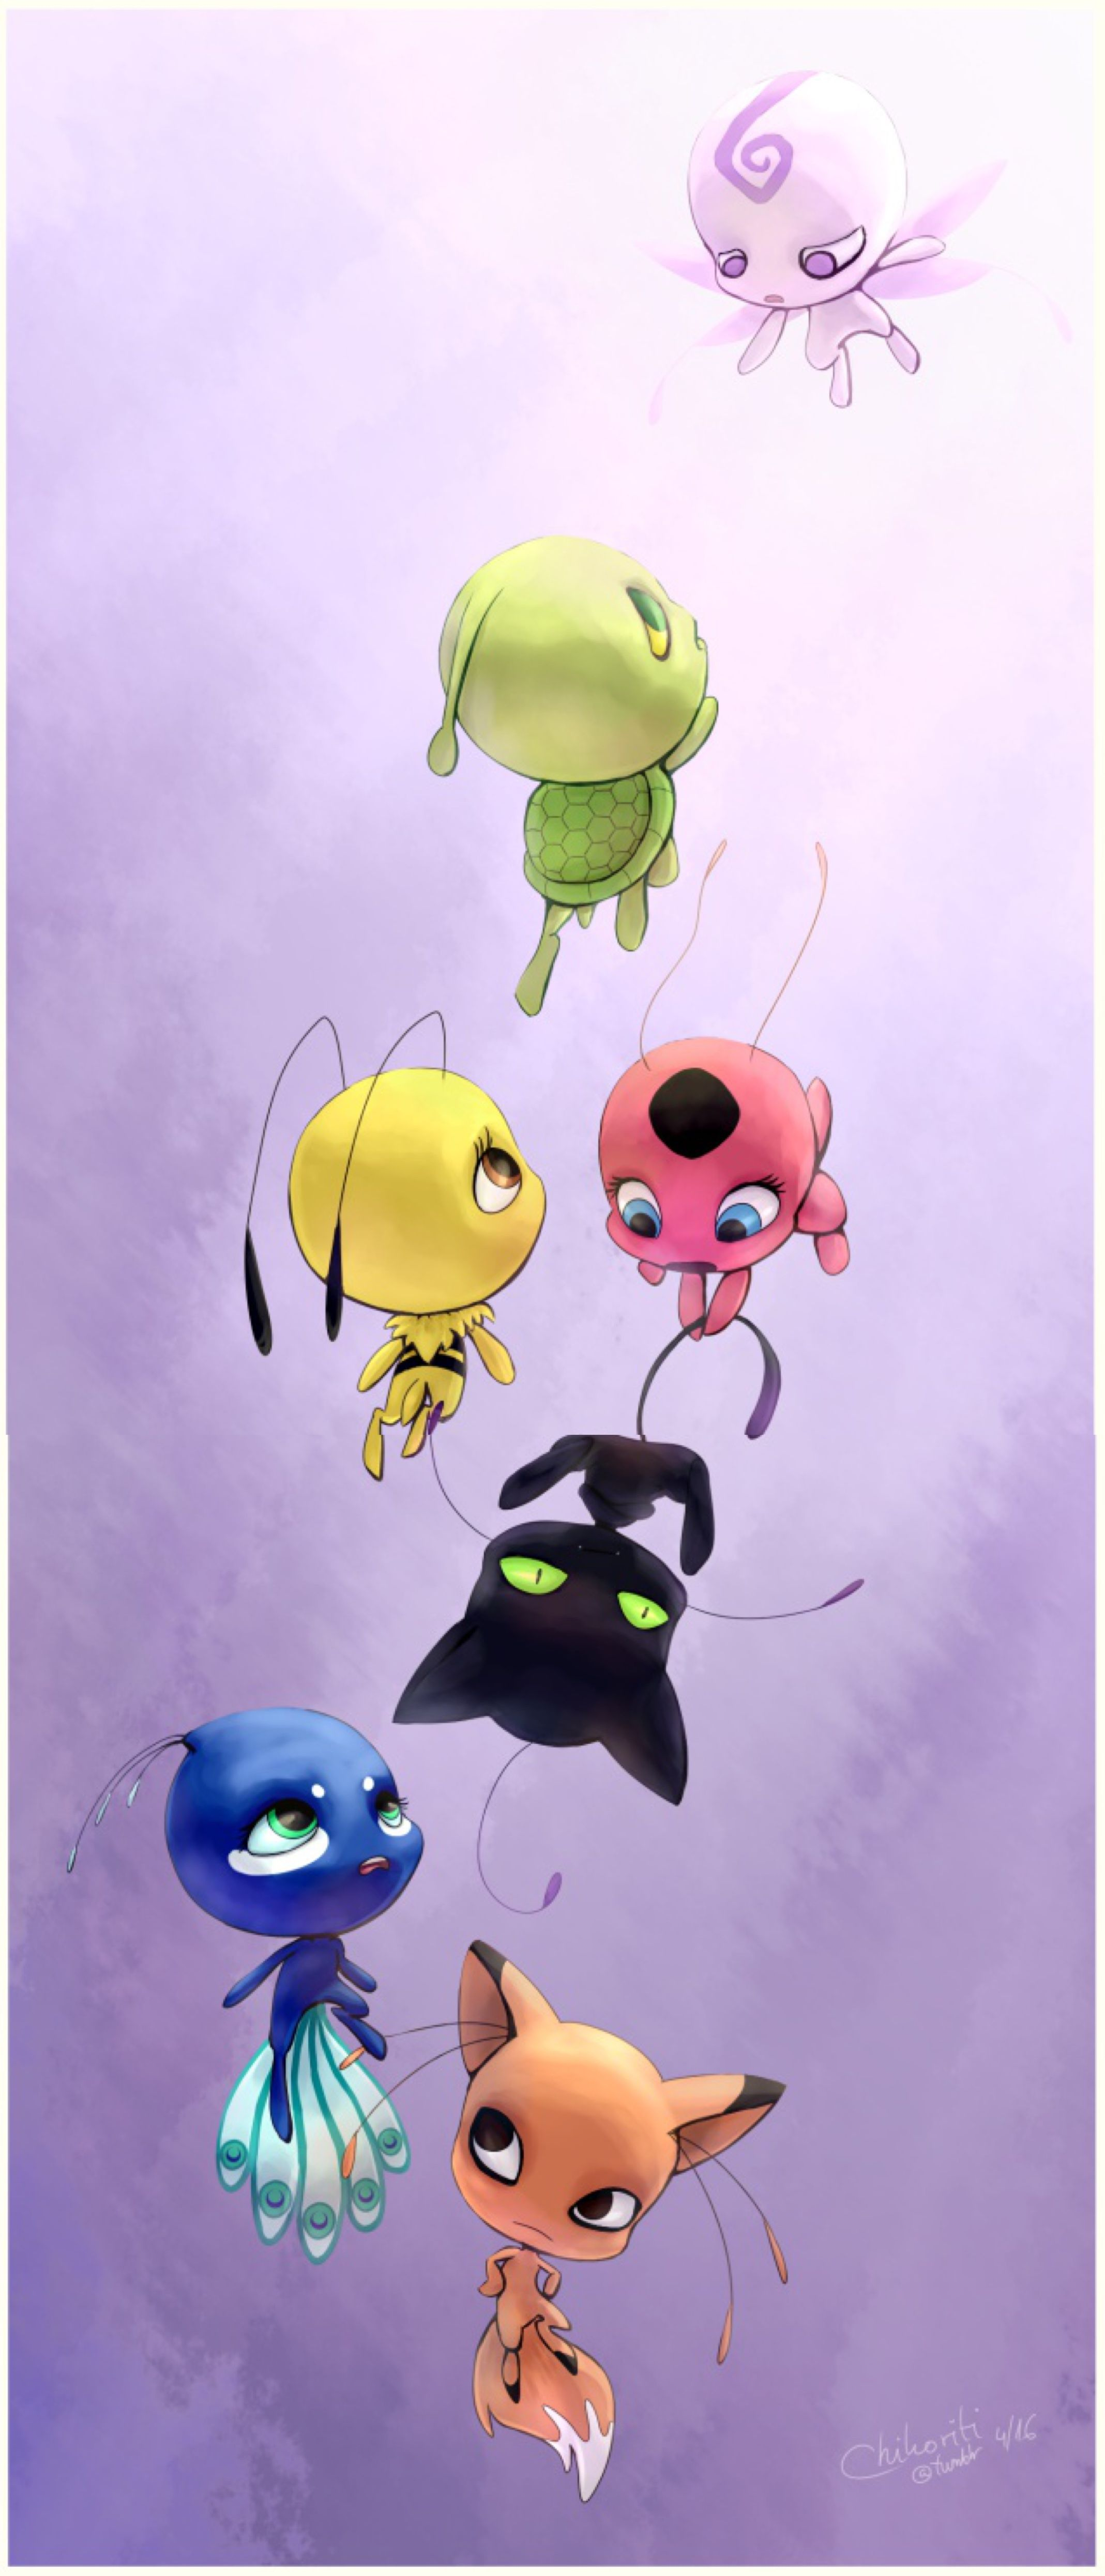 Too Cute Miraculous Wallpaper Miraculous Ladybug Wallpaper Miraculous Ladybug Anime